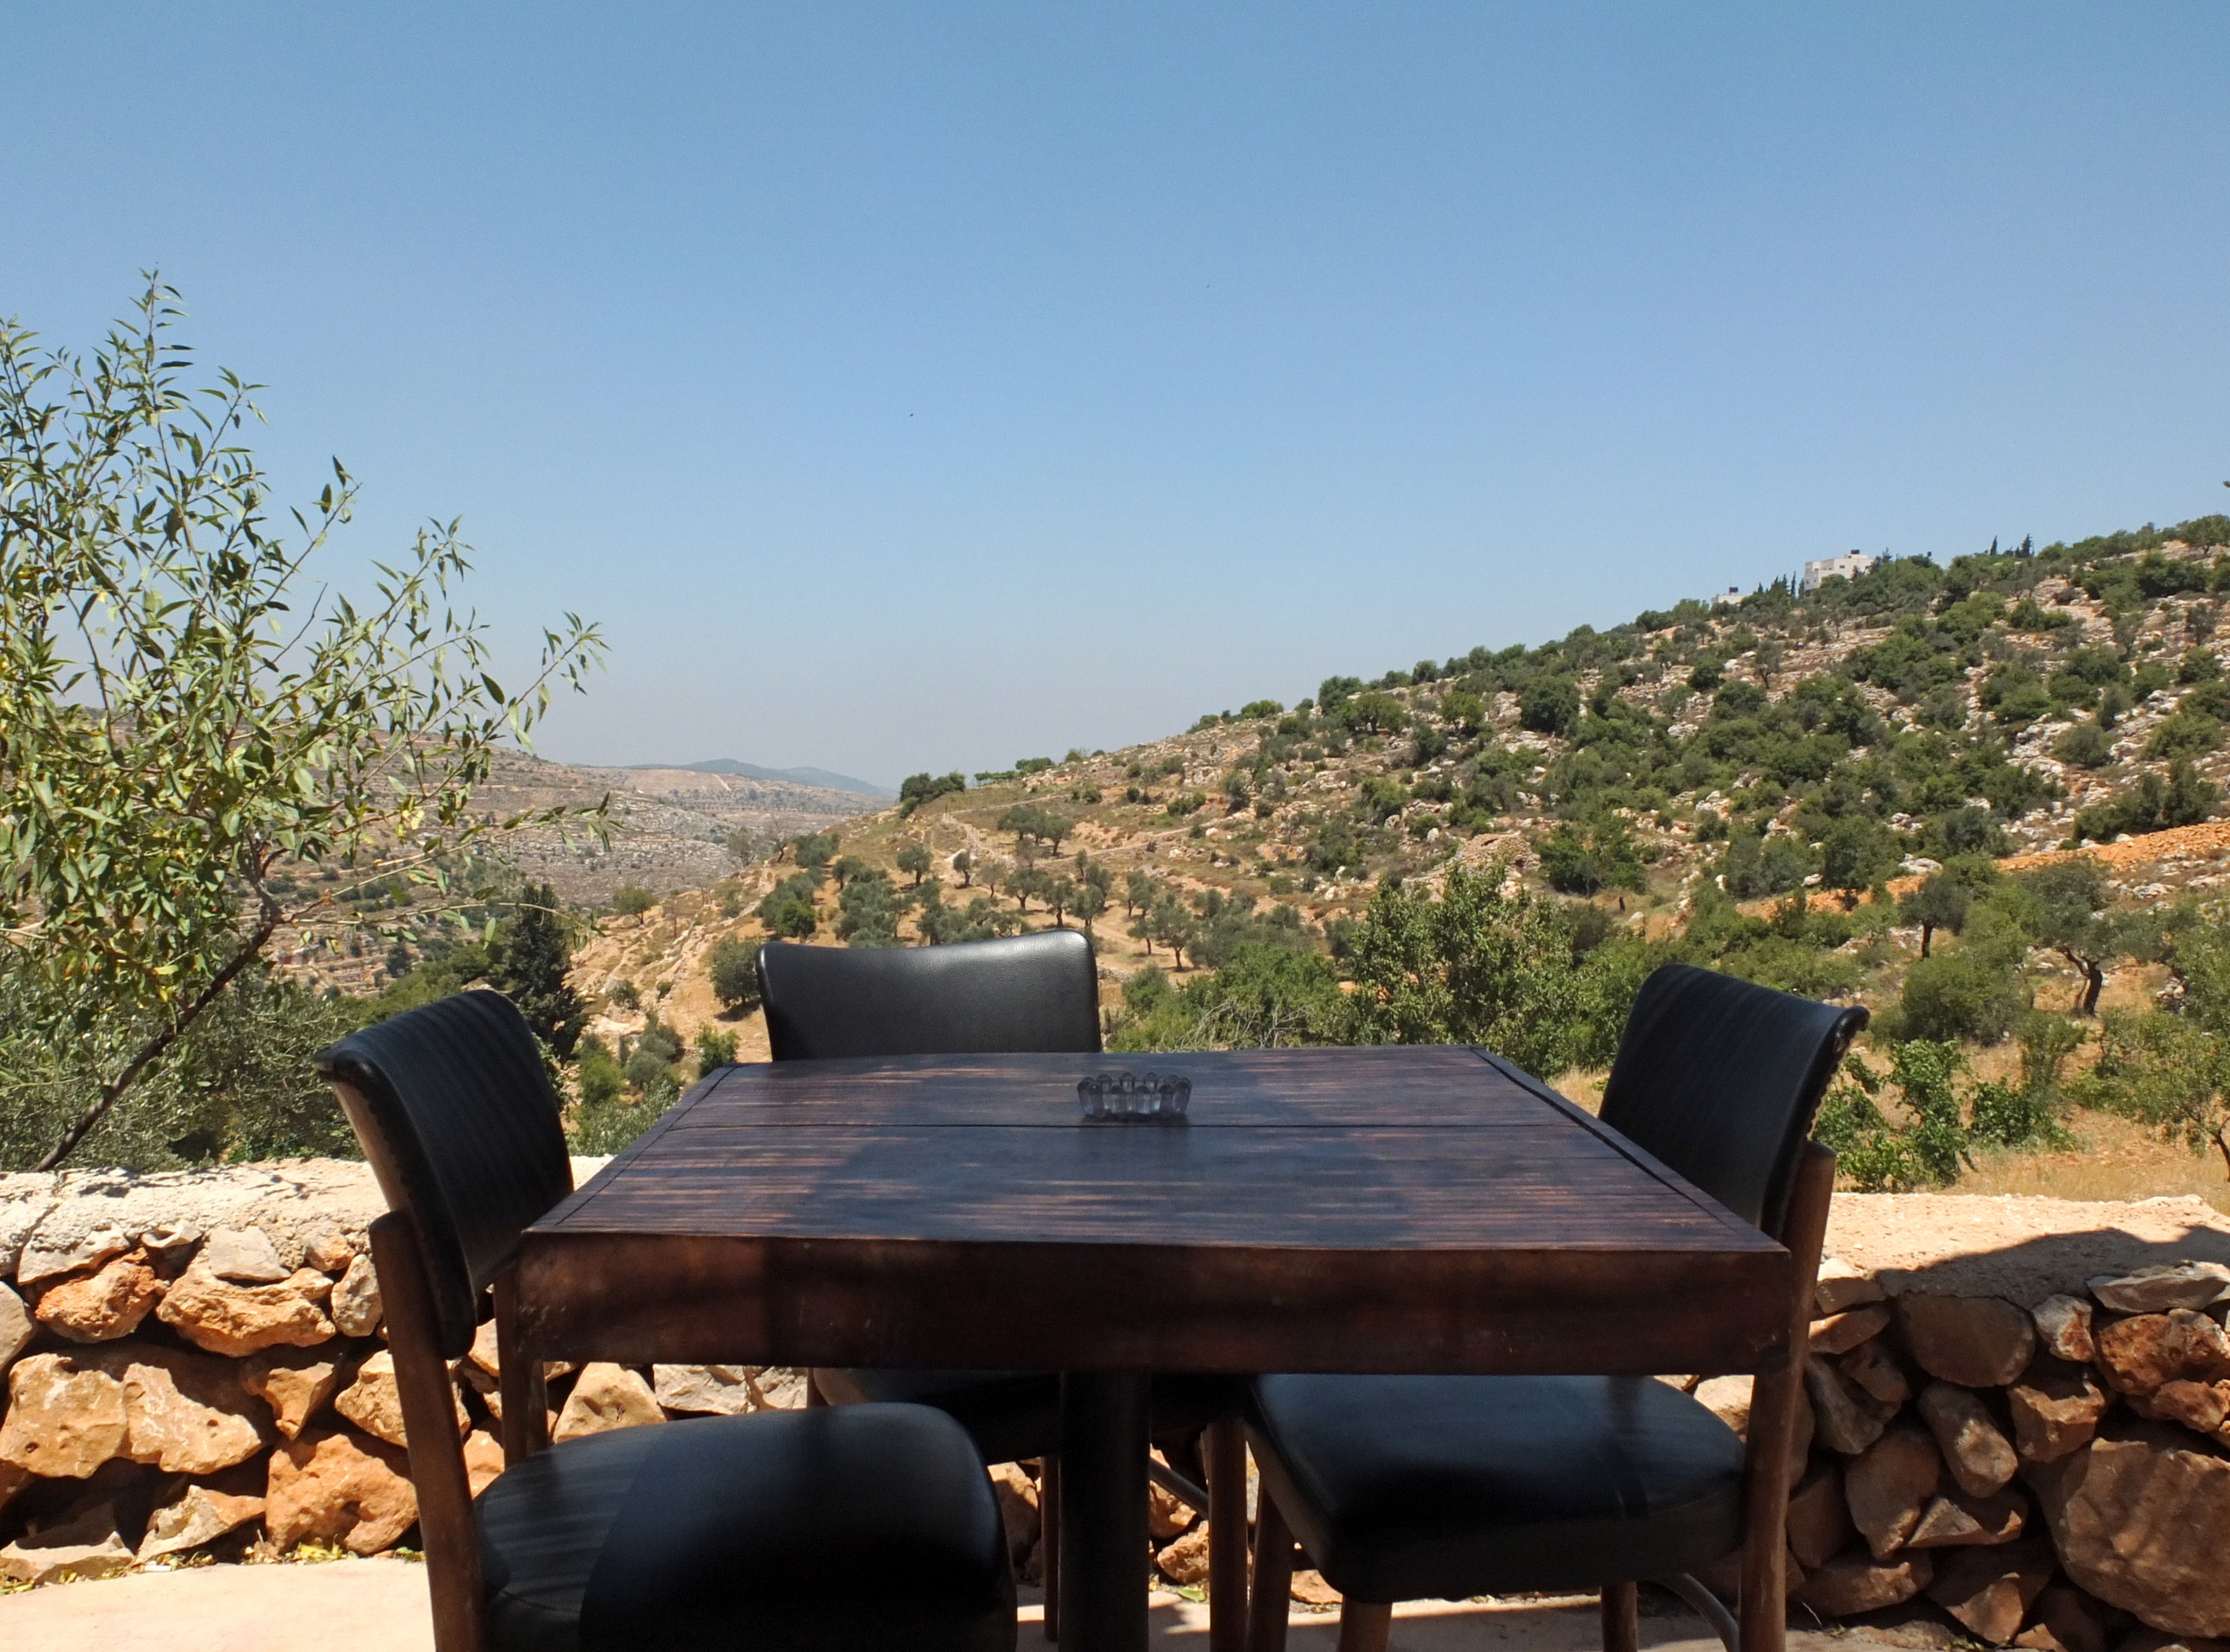 Observer Magazine (UK), 1/24/16  The view from Hosh Jasmin  (Beit Jala, Palestine)